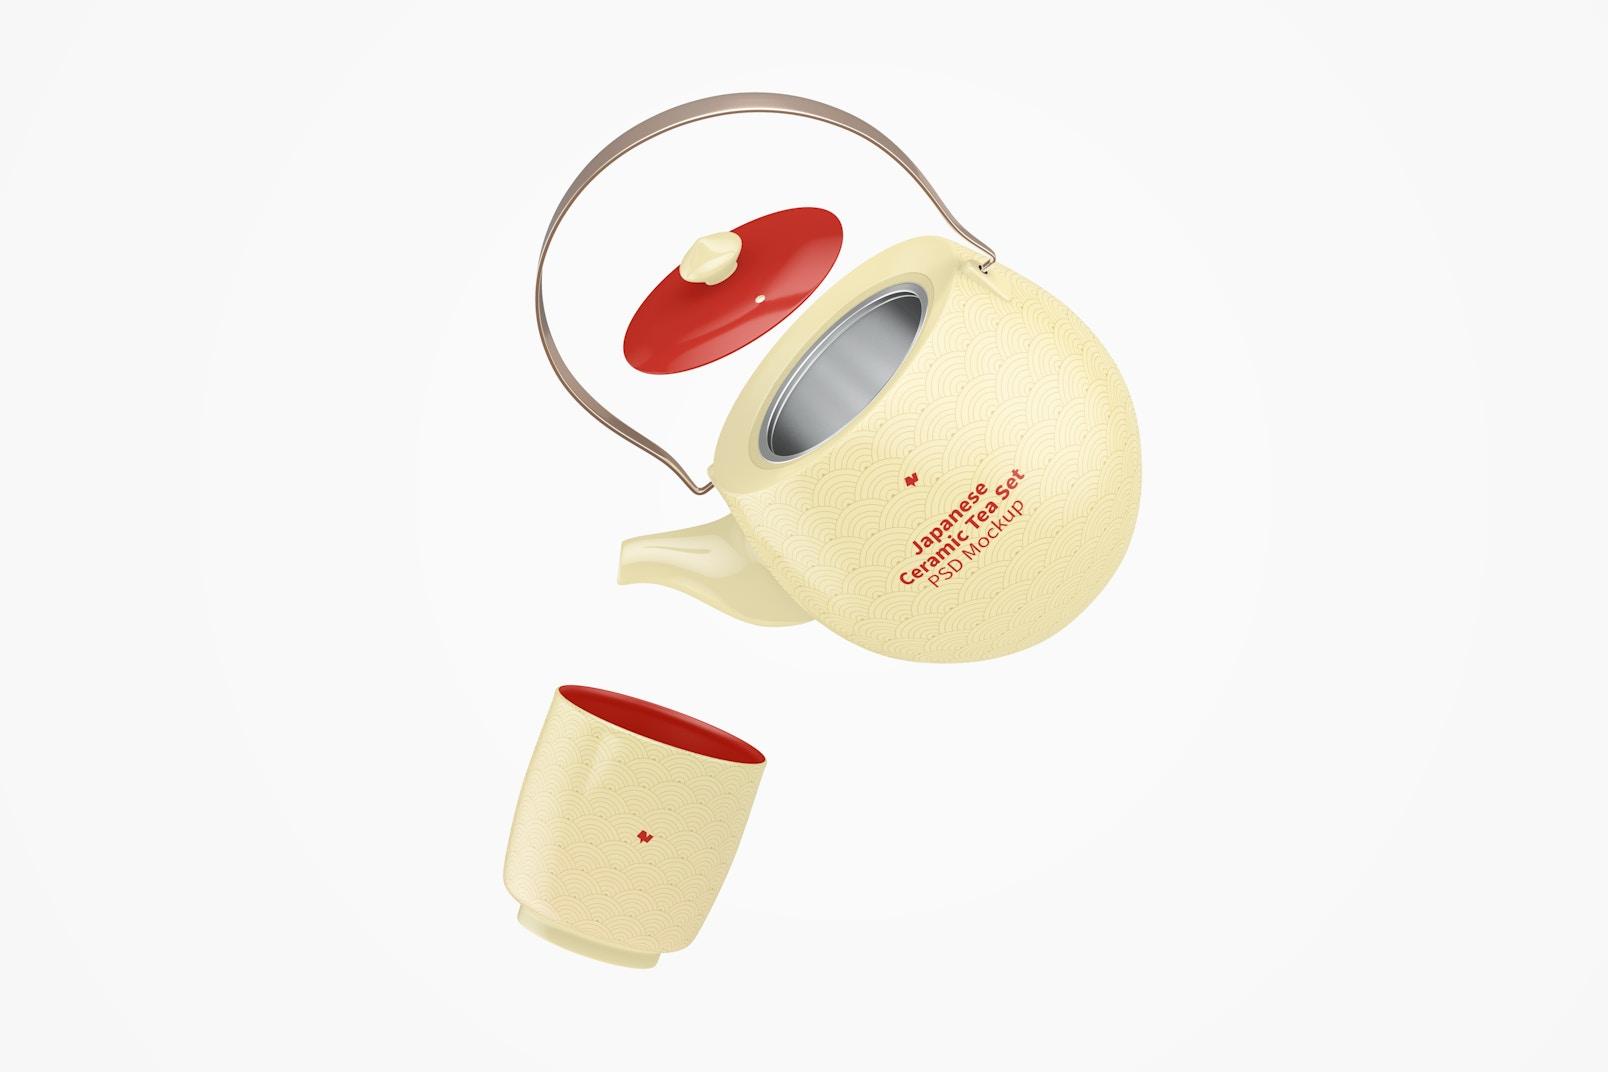 Japanese Ceramic Tea Set Mockup, Floating